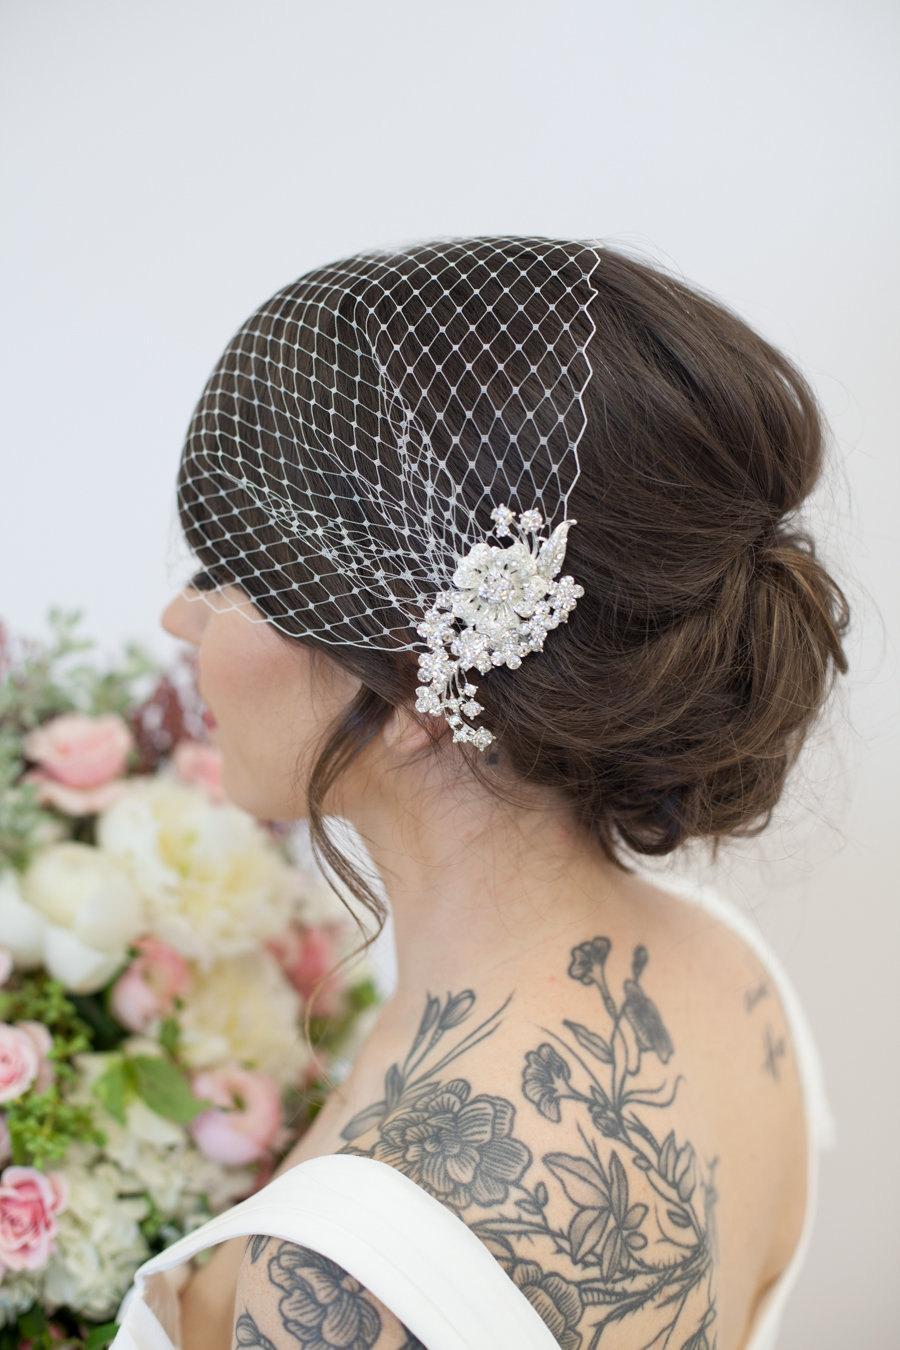 زفاف - Birdcage Veil, Bridal Veil and Bridal Comb, Bandeau Birdcage Veil, Blusher Bird Cage Veil - QUICK SHIPPER - Detachable Rhinestone Hair Comb